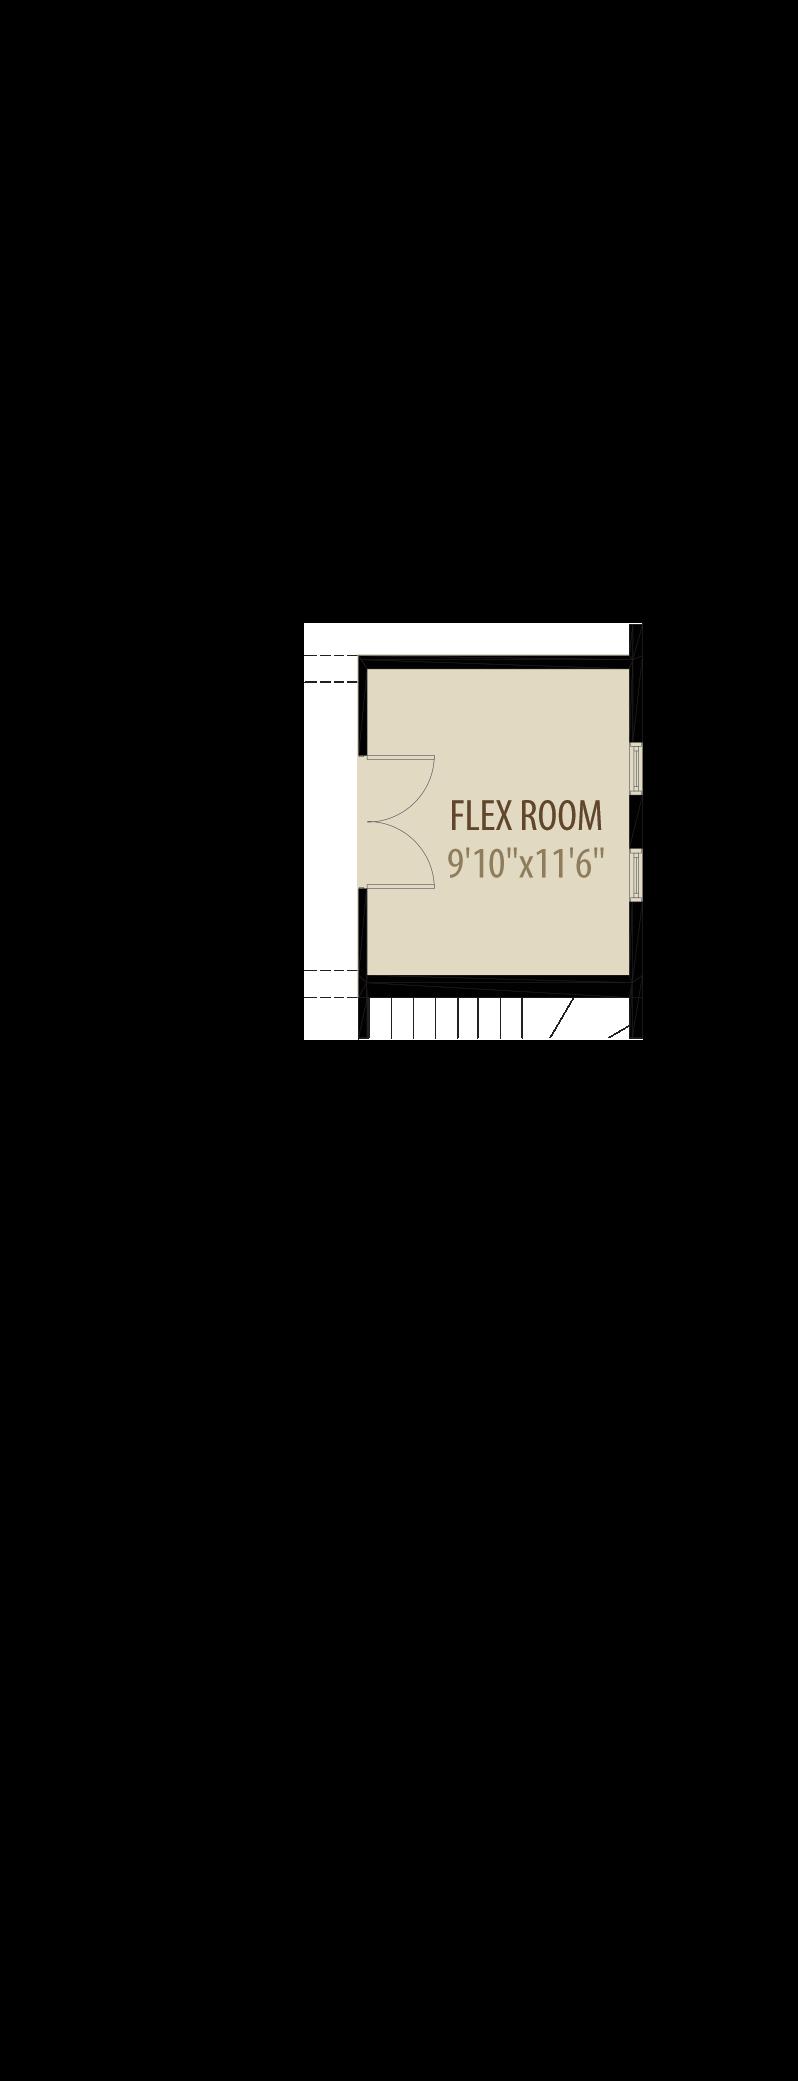 Option 1 Enclosed Flex Room